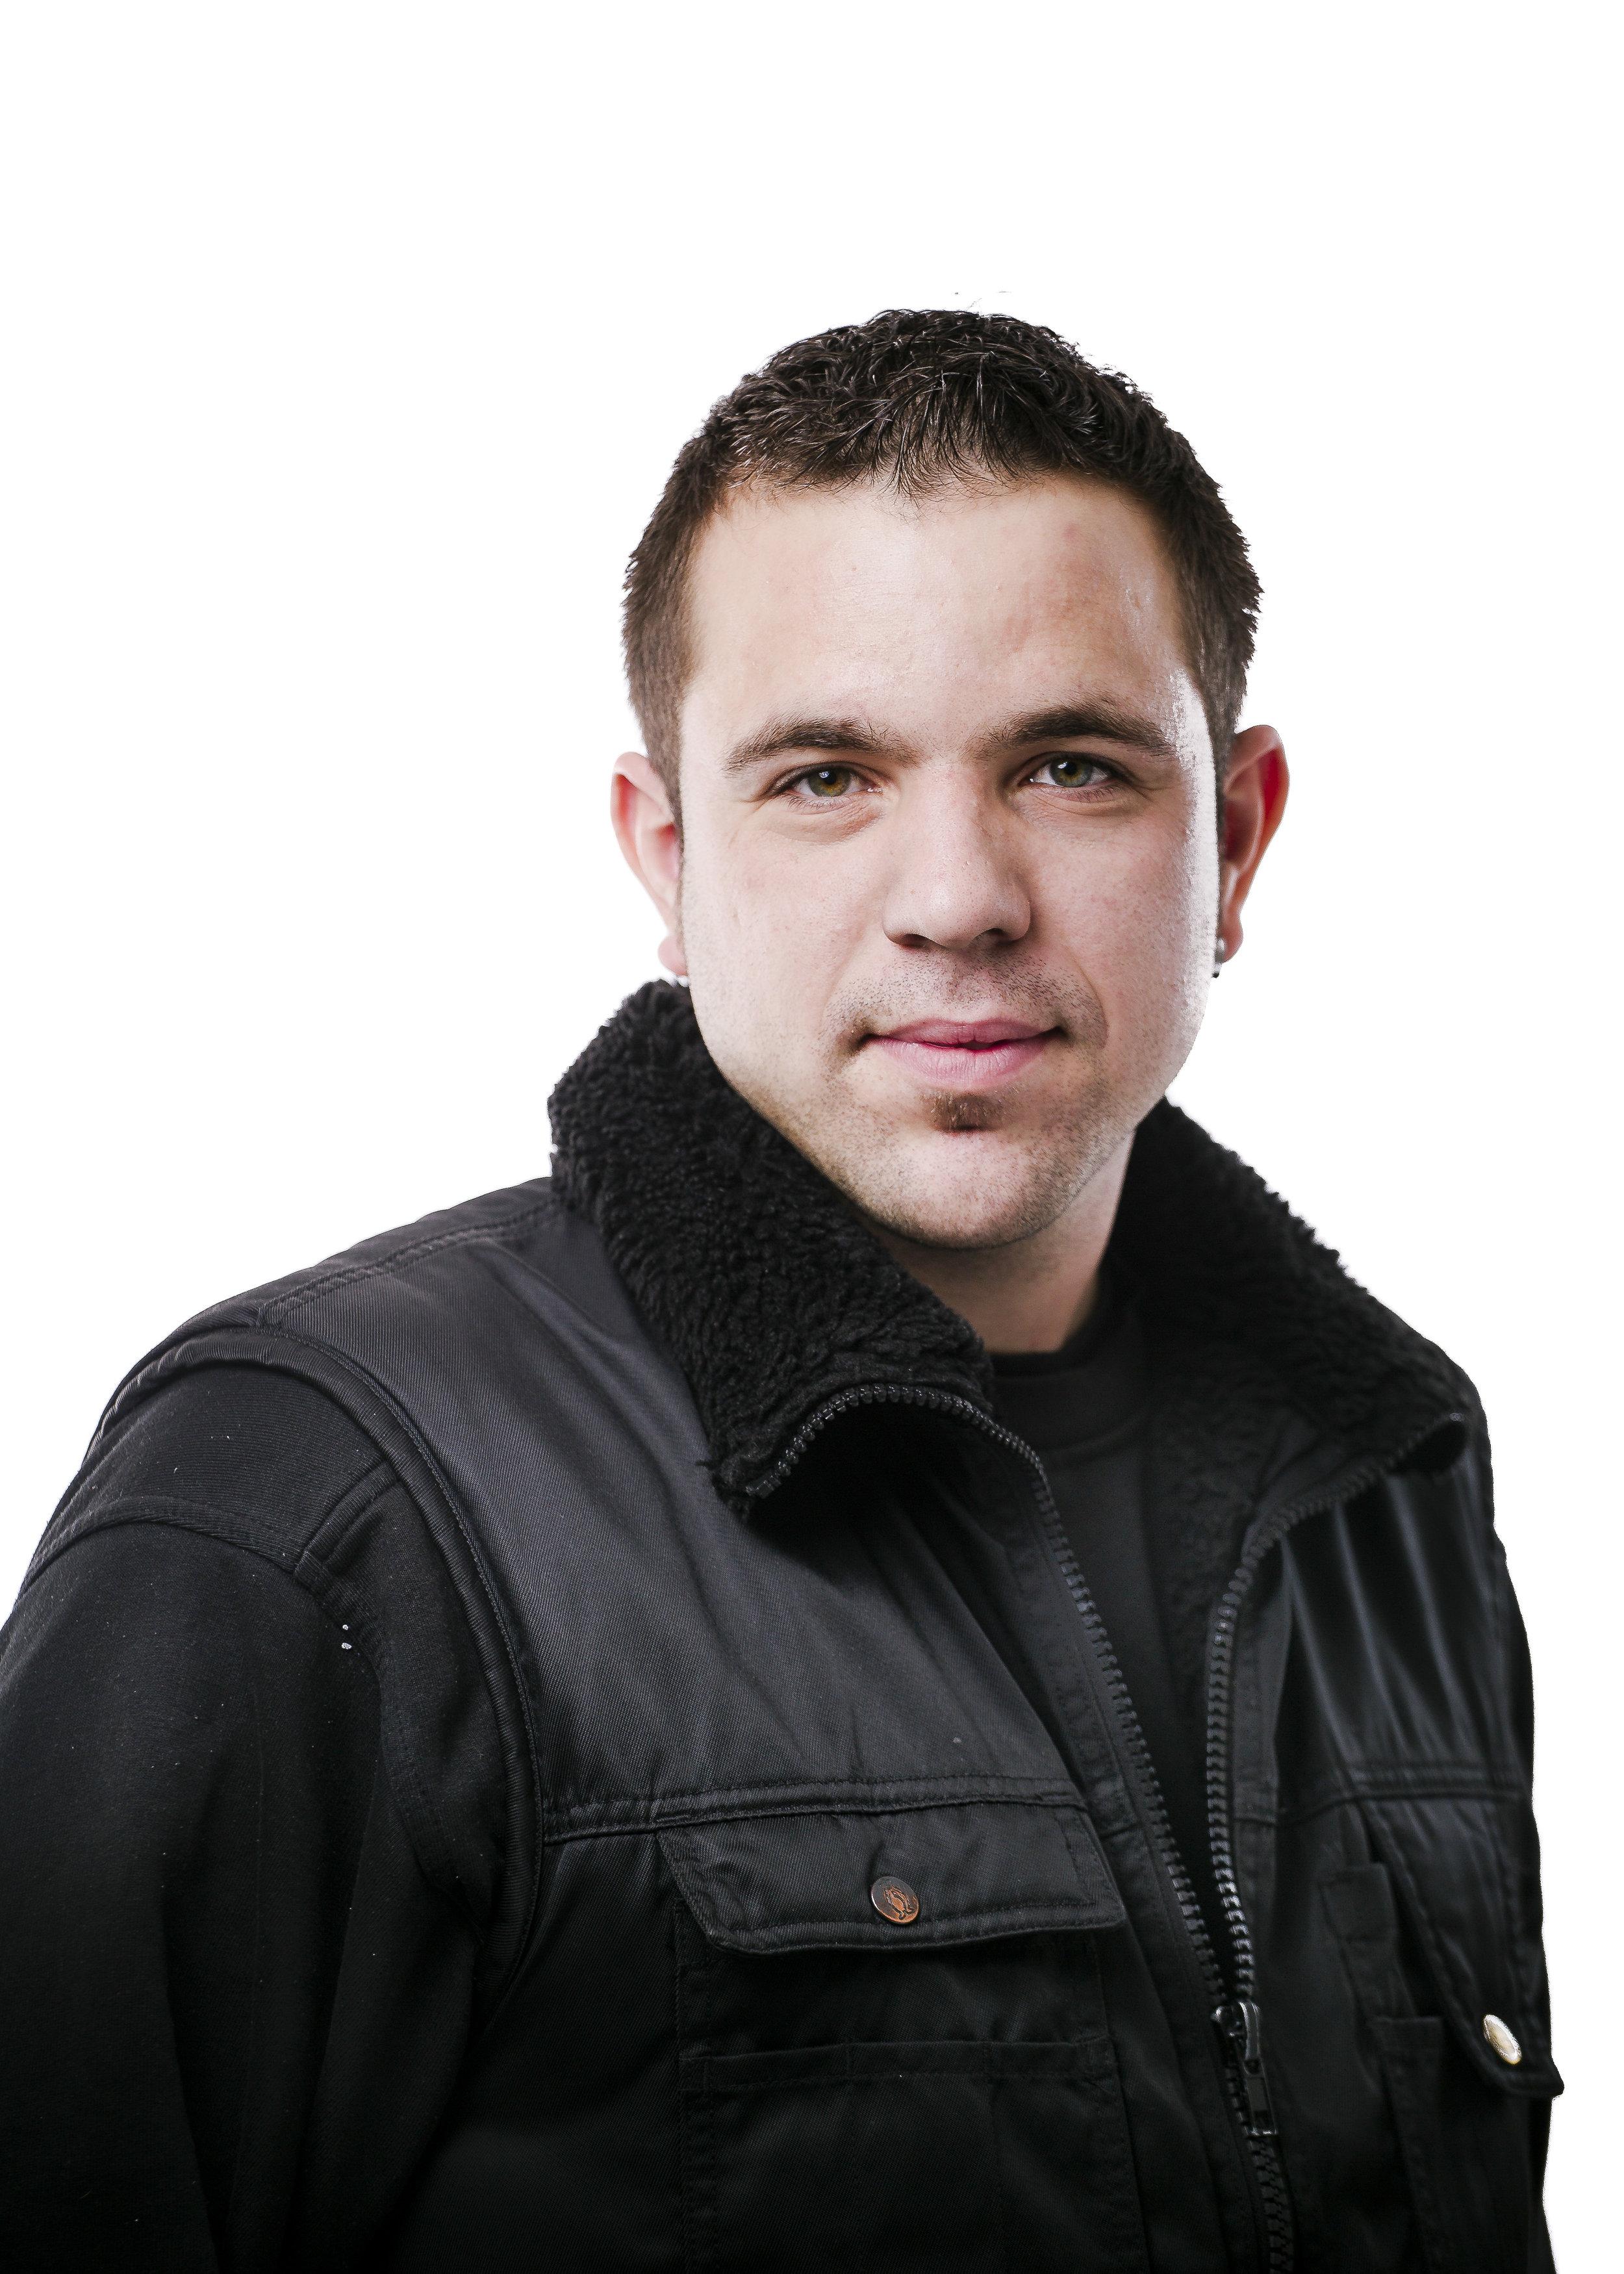 Andreas Knoll, Mechanic